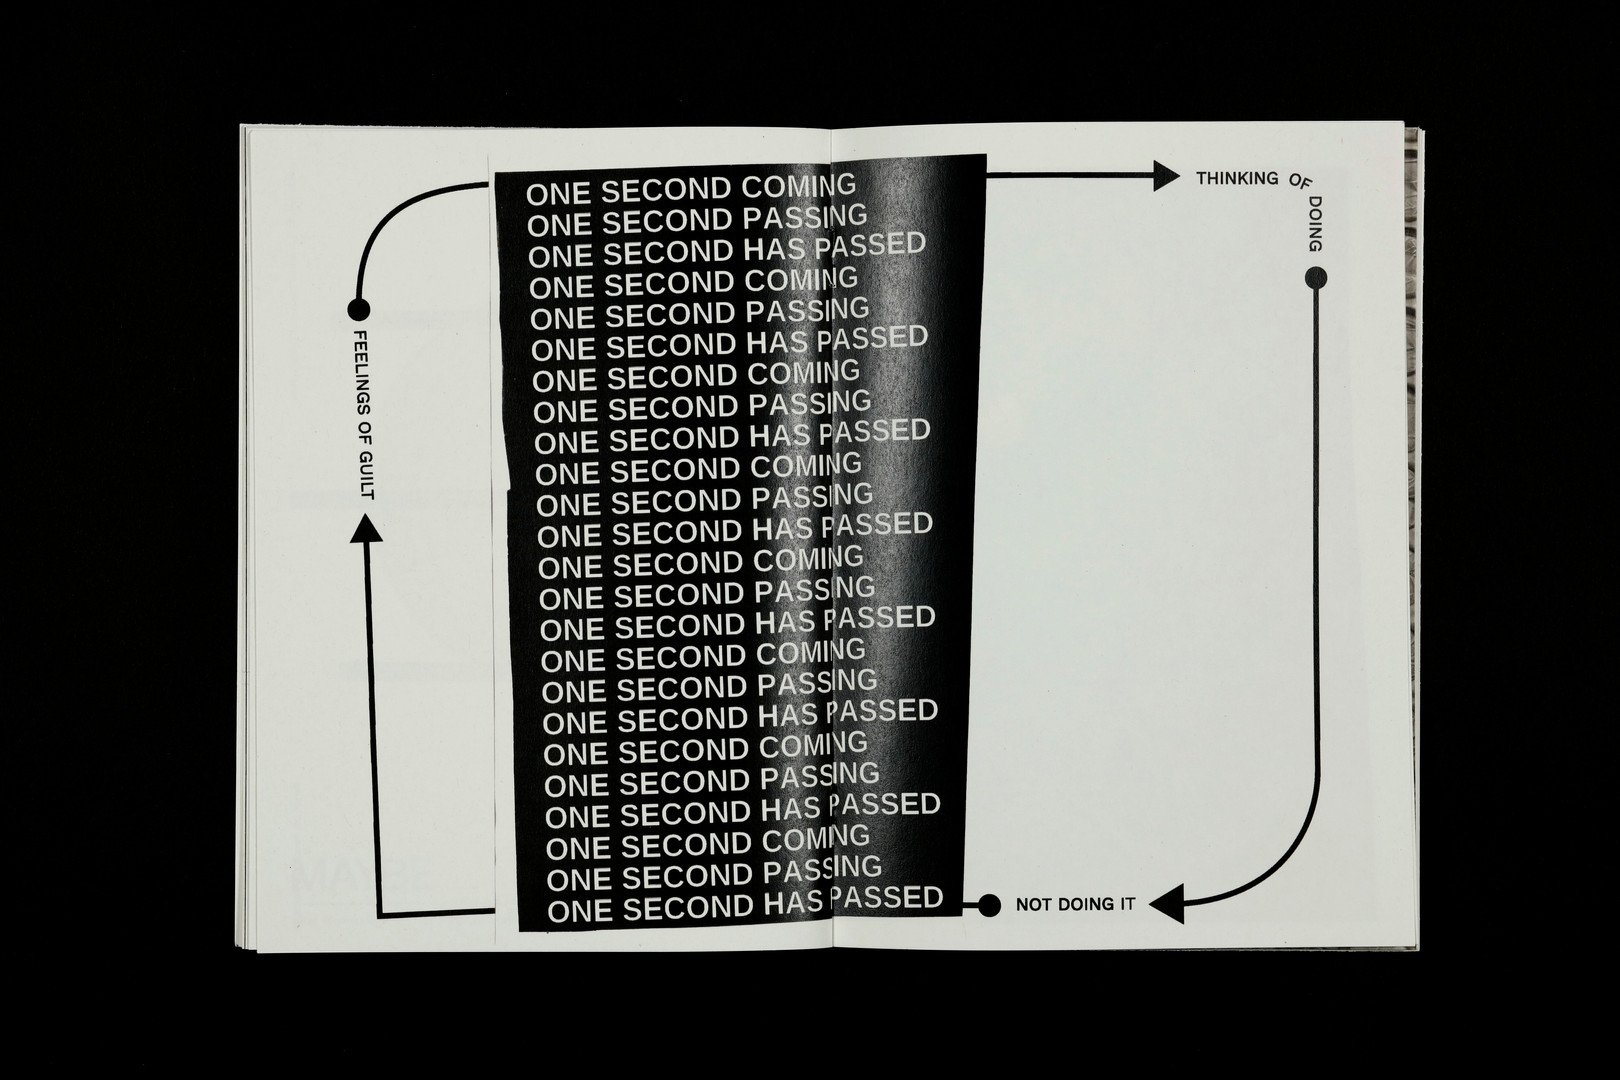 Procastination-Book-Mock-up_11.jpg